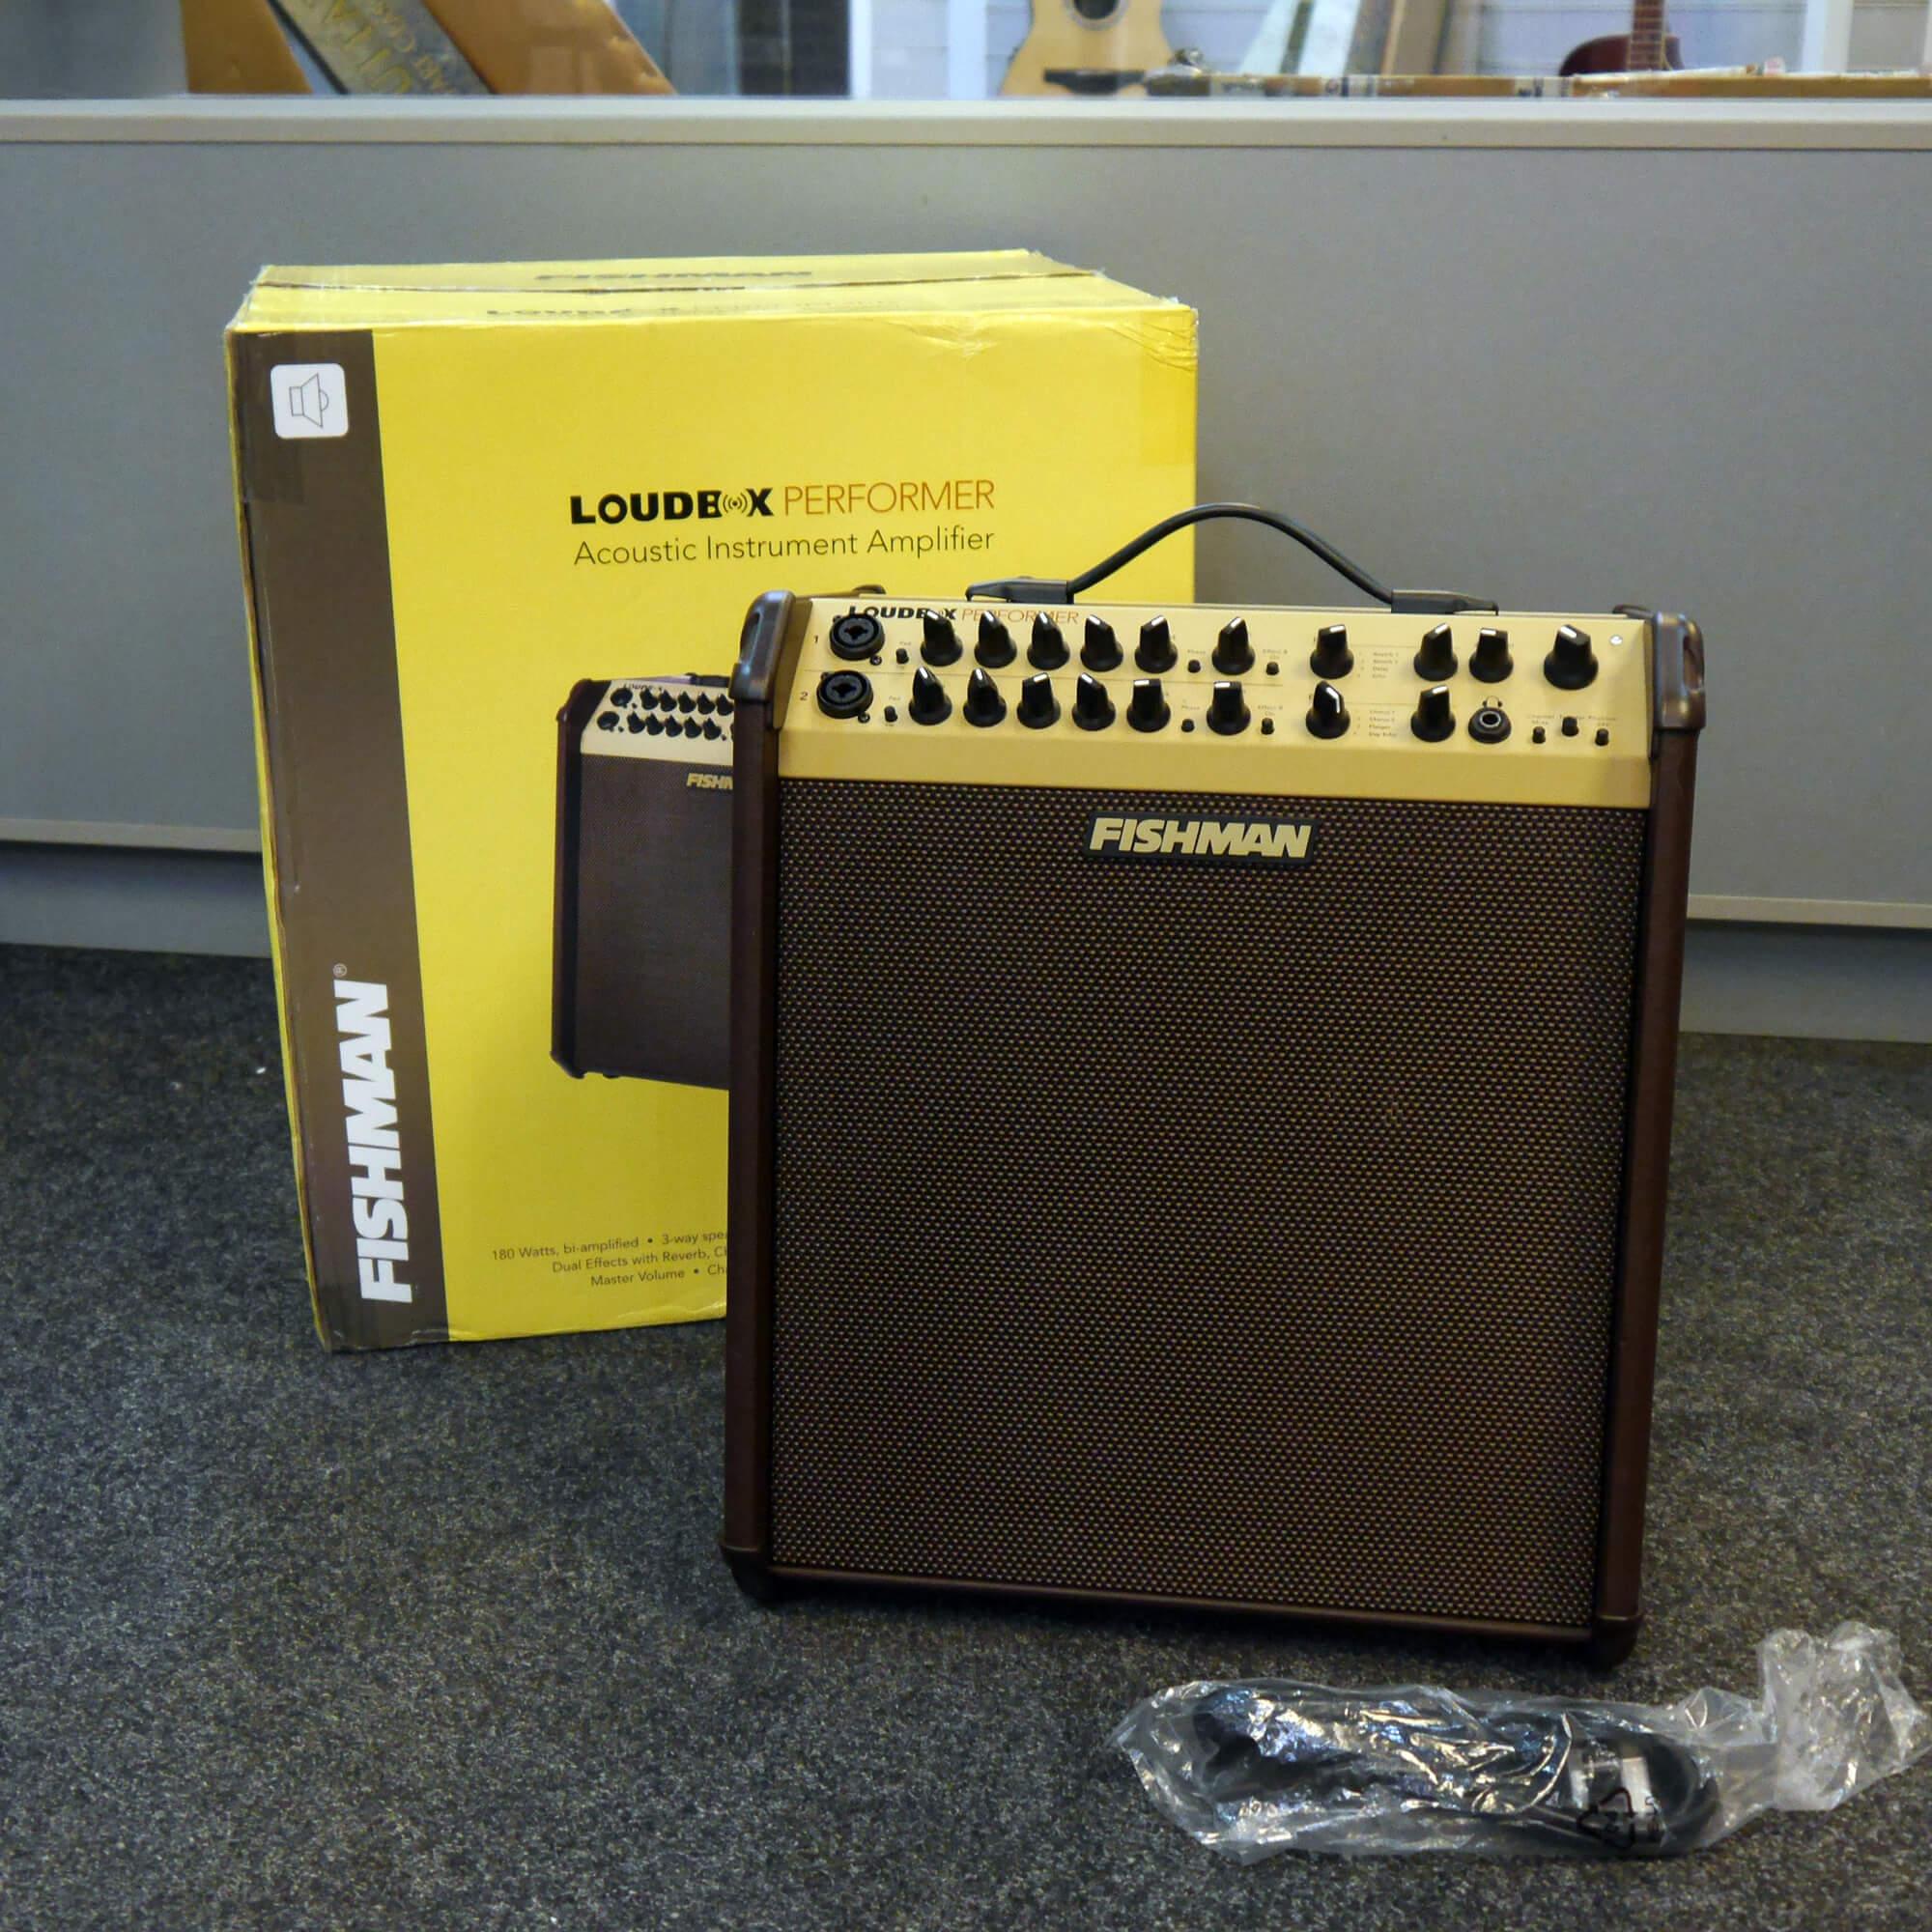 Fishman Loudbox Performer Acoustic Guitar Amplifier w/Box & PSU - 2nd Hand